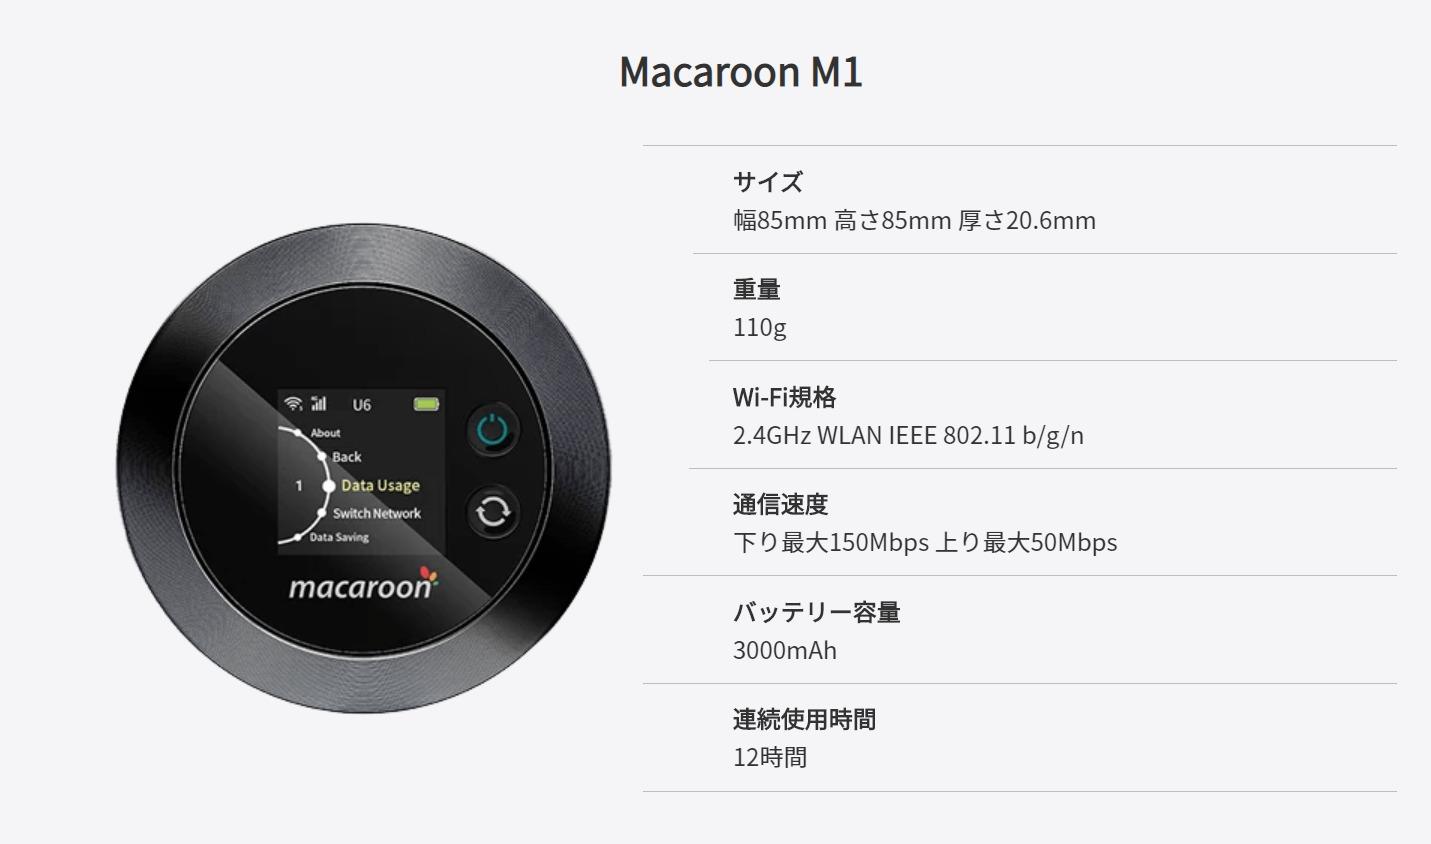 MONSTER MOBILE の端末「Macaroon M1」の仕様